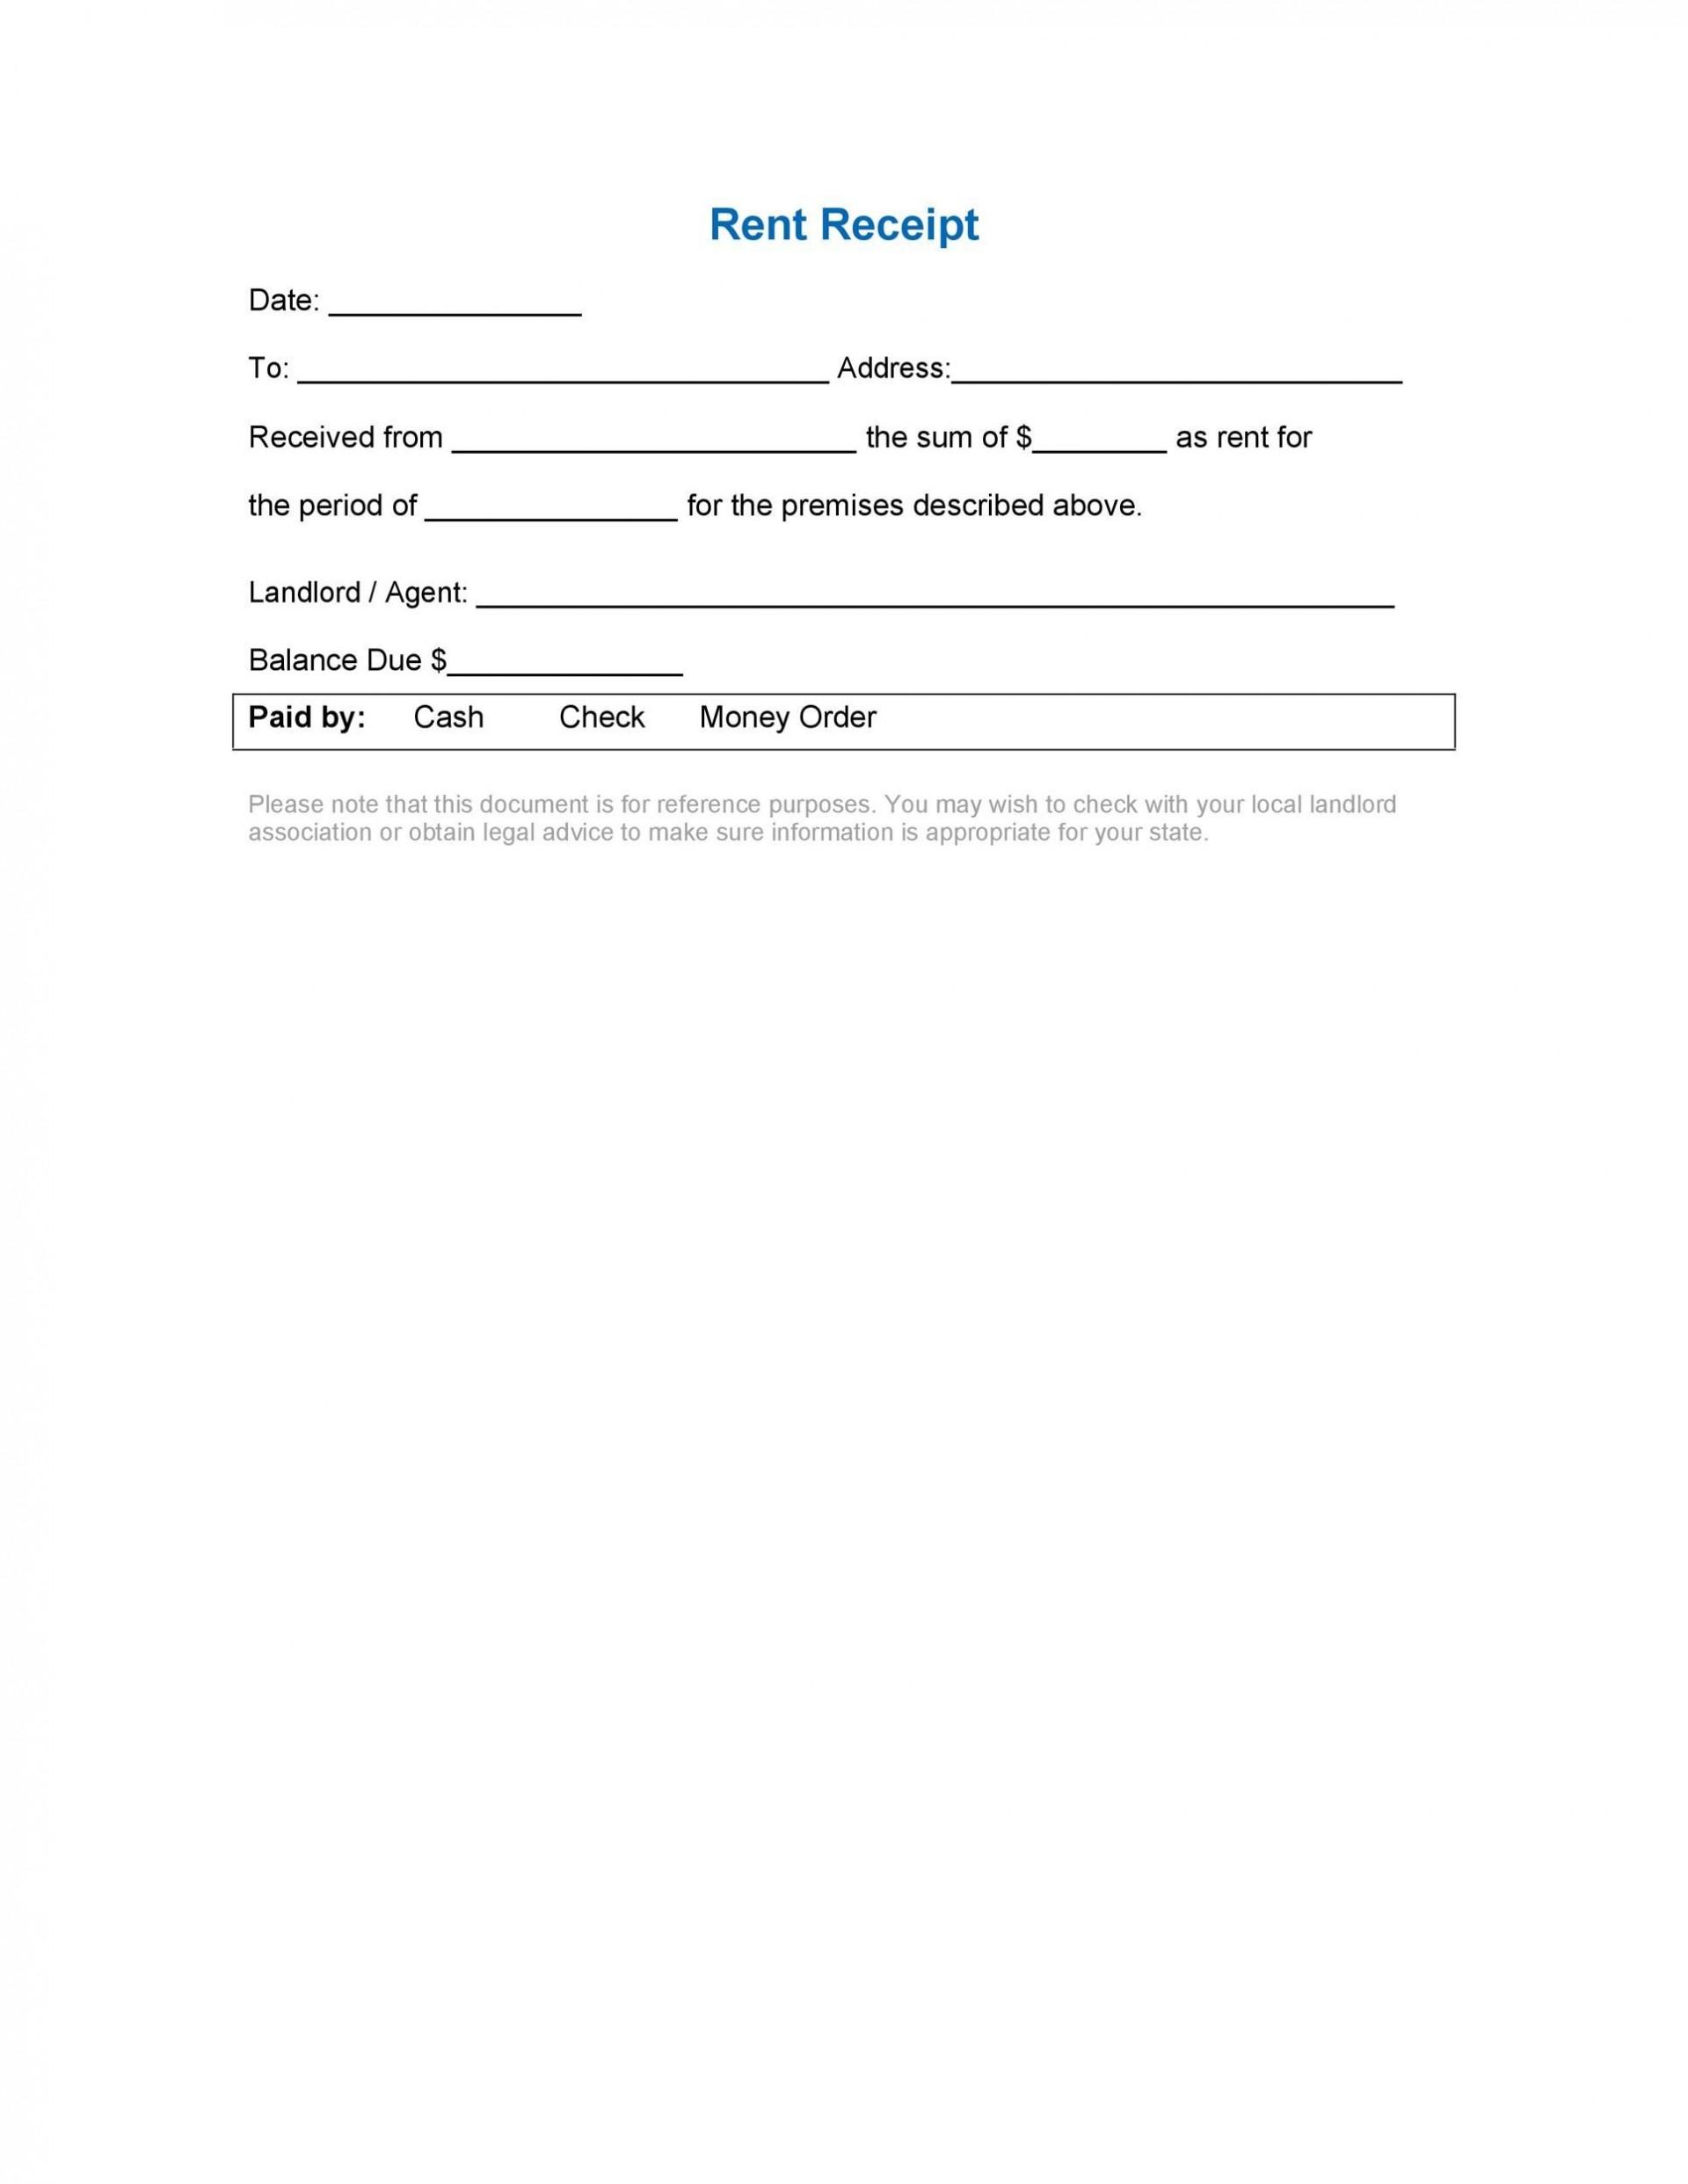 002 Remarkable Sample Rent Receipt Word Doc High Def 1920